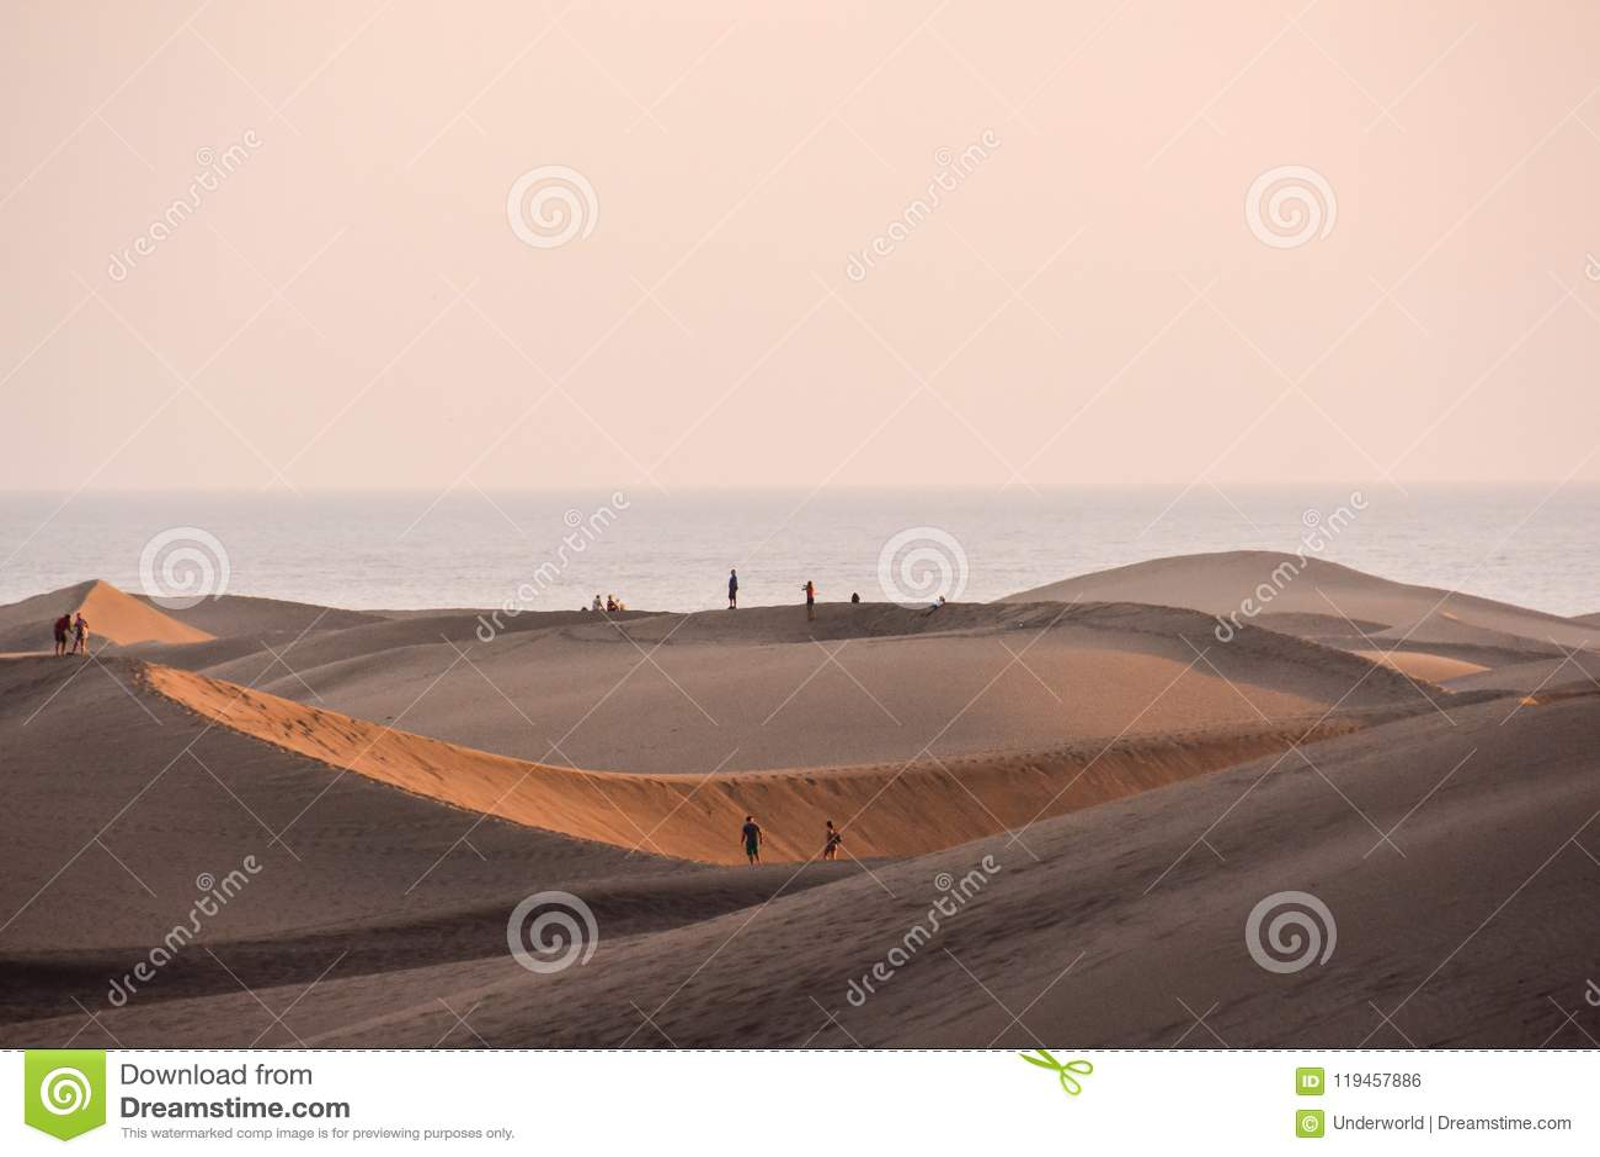 Woestijn met zandduinen in Gran Canaria Spanje